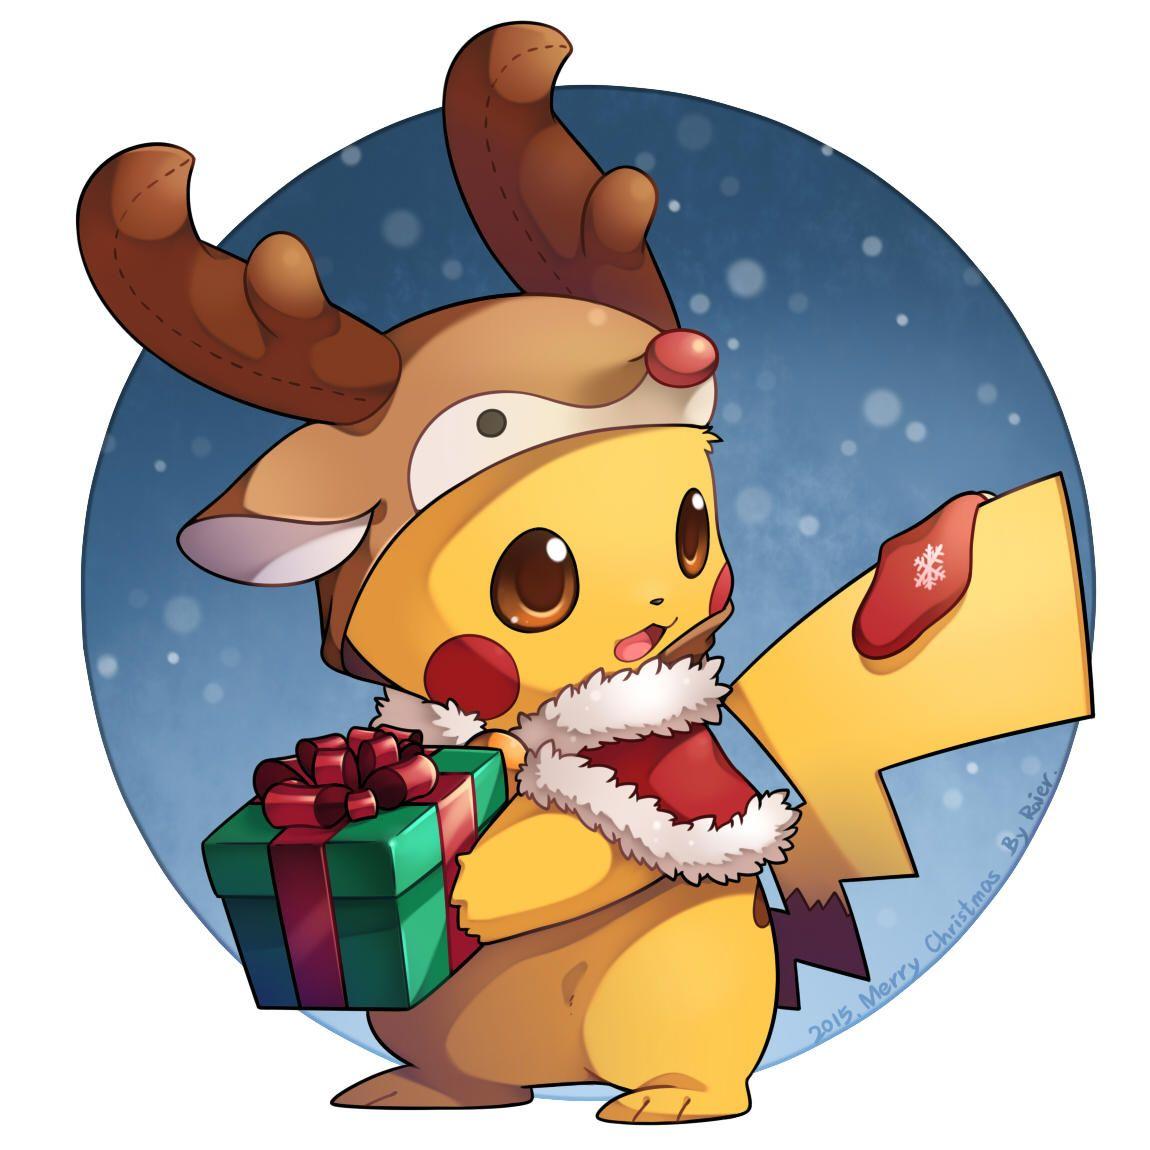 Reindeer Pikachu Pokemon Pikachu Art Cute Pokemon Wallpaper Pikachu Drawing